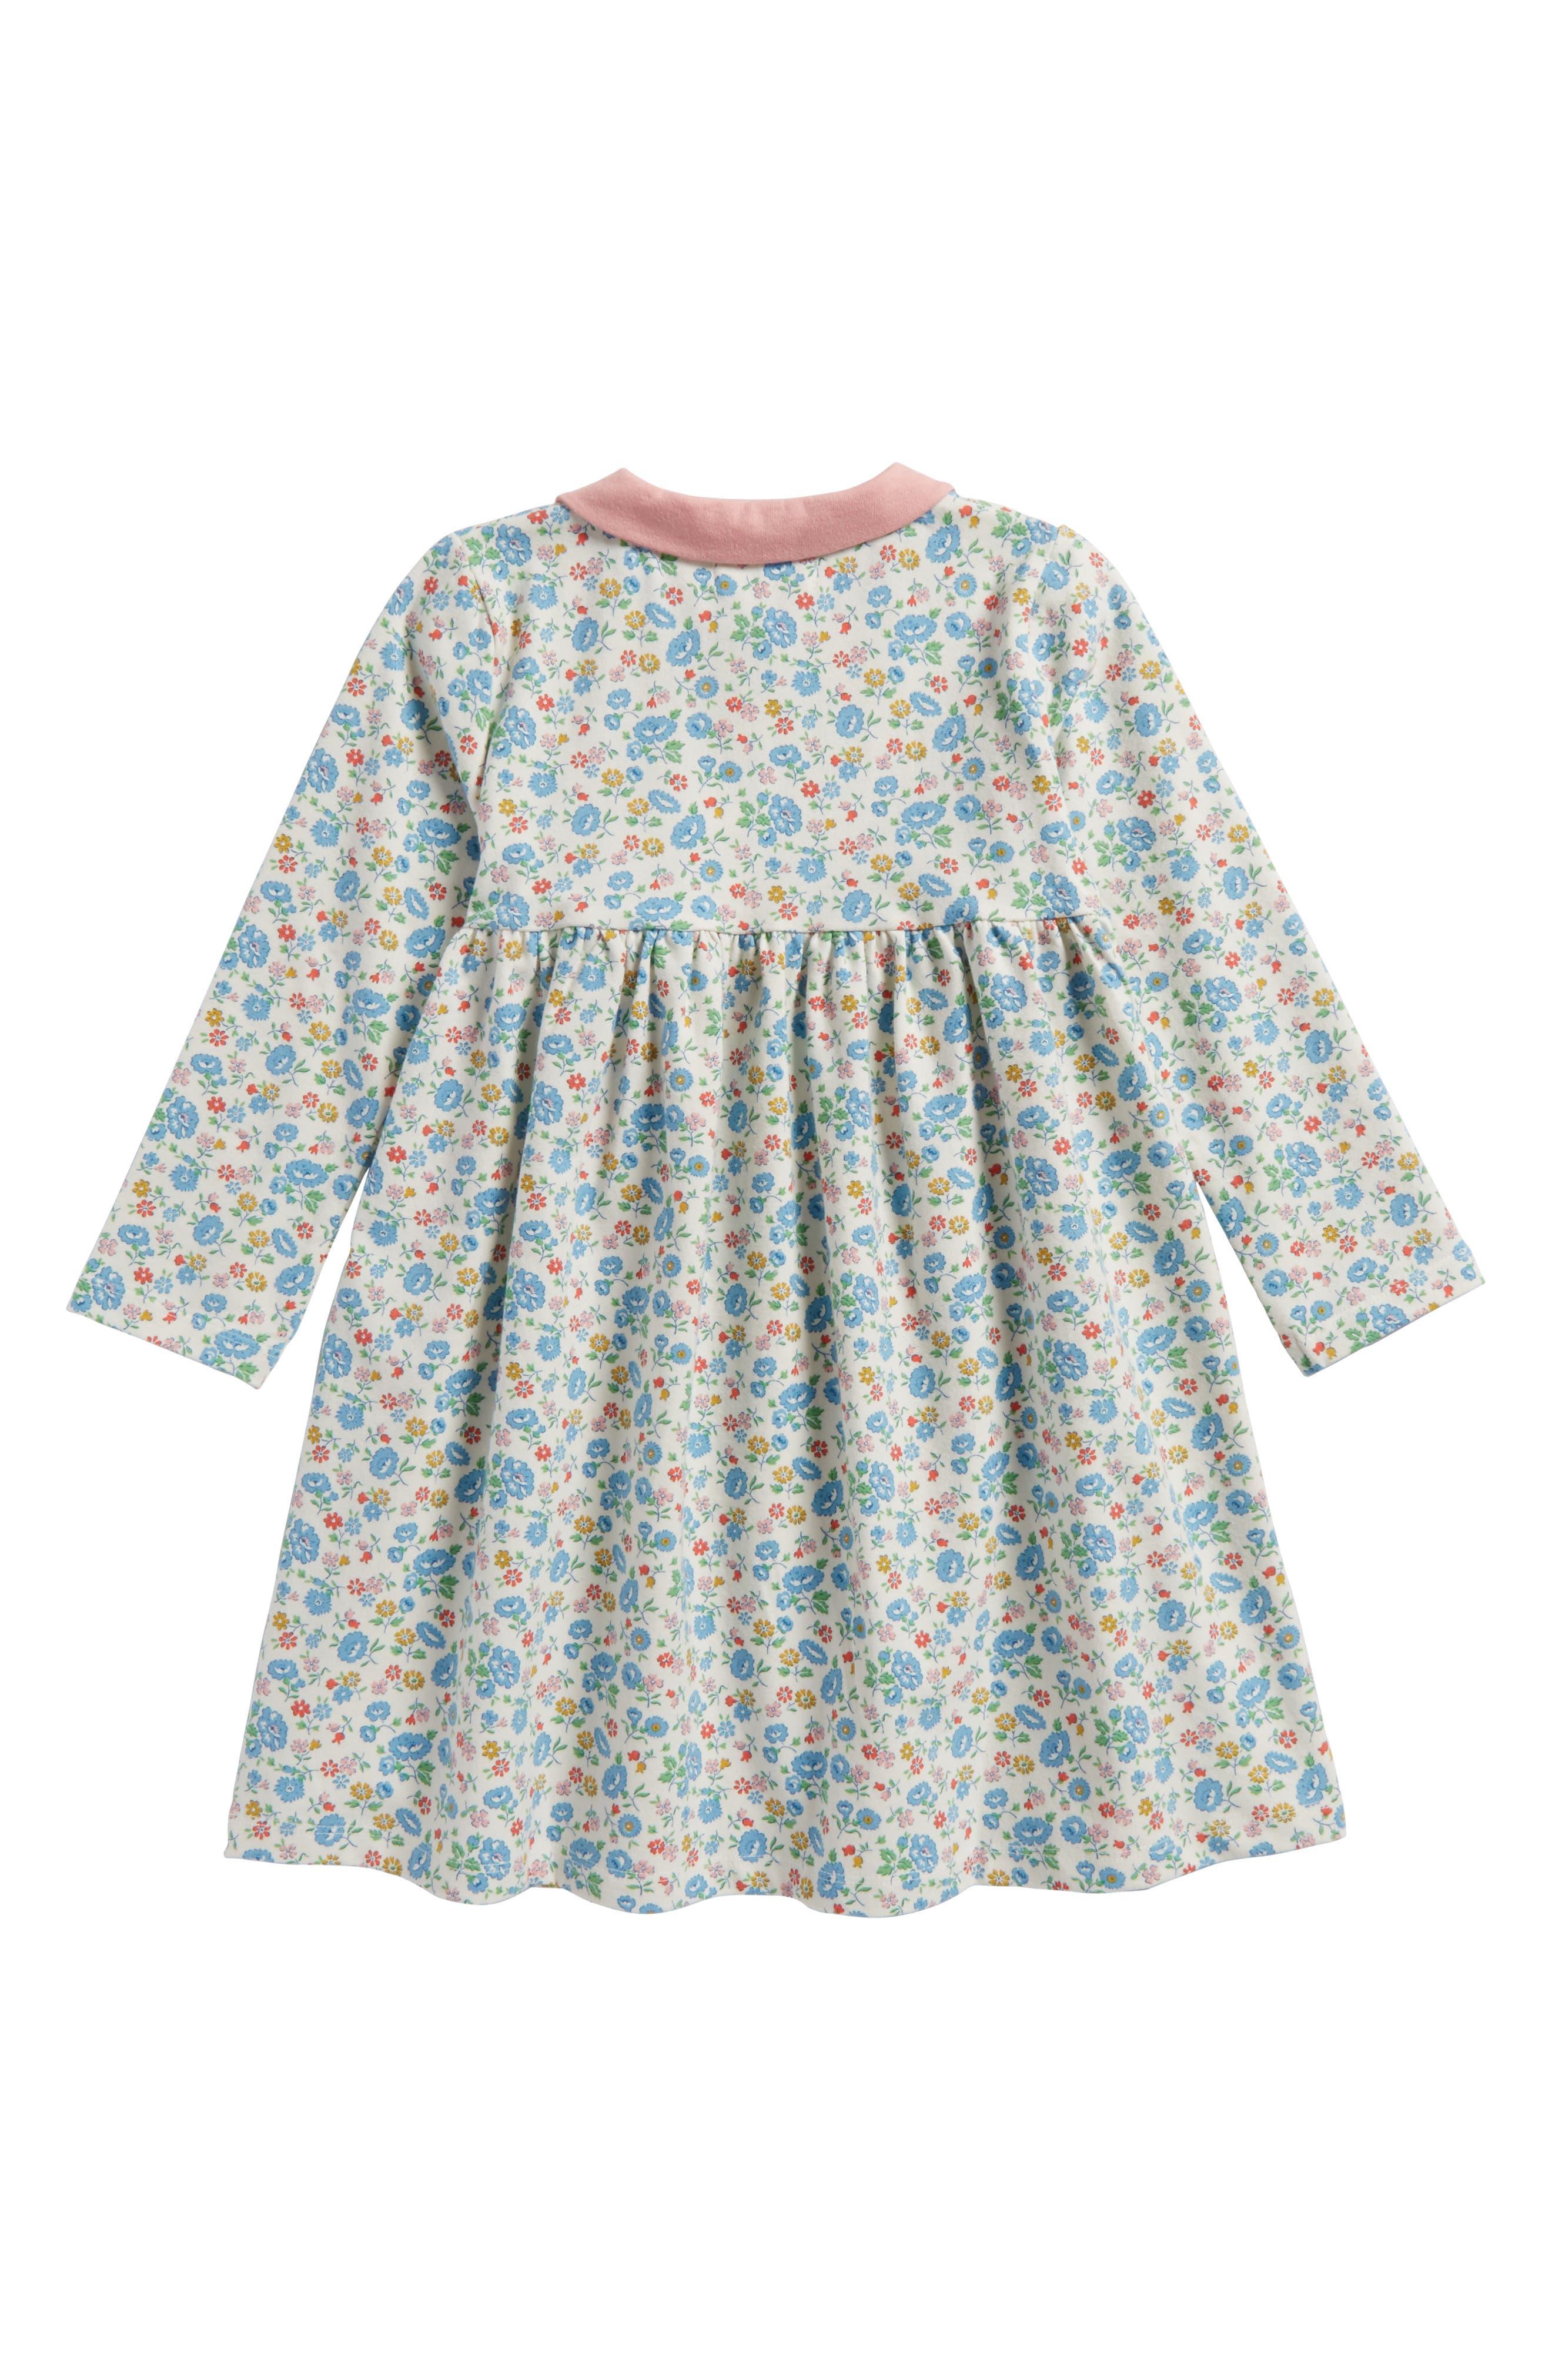 Pretty Peter Pan Collar Jersey Dress,                             Alternate thumbnail 2, color,                             Ecru Summer Floral